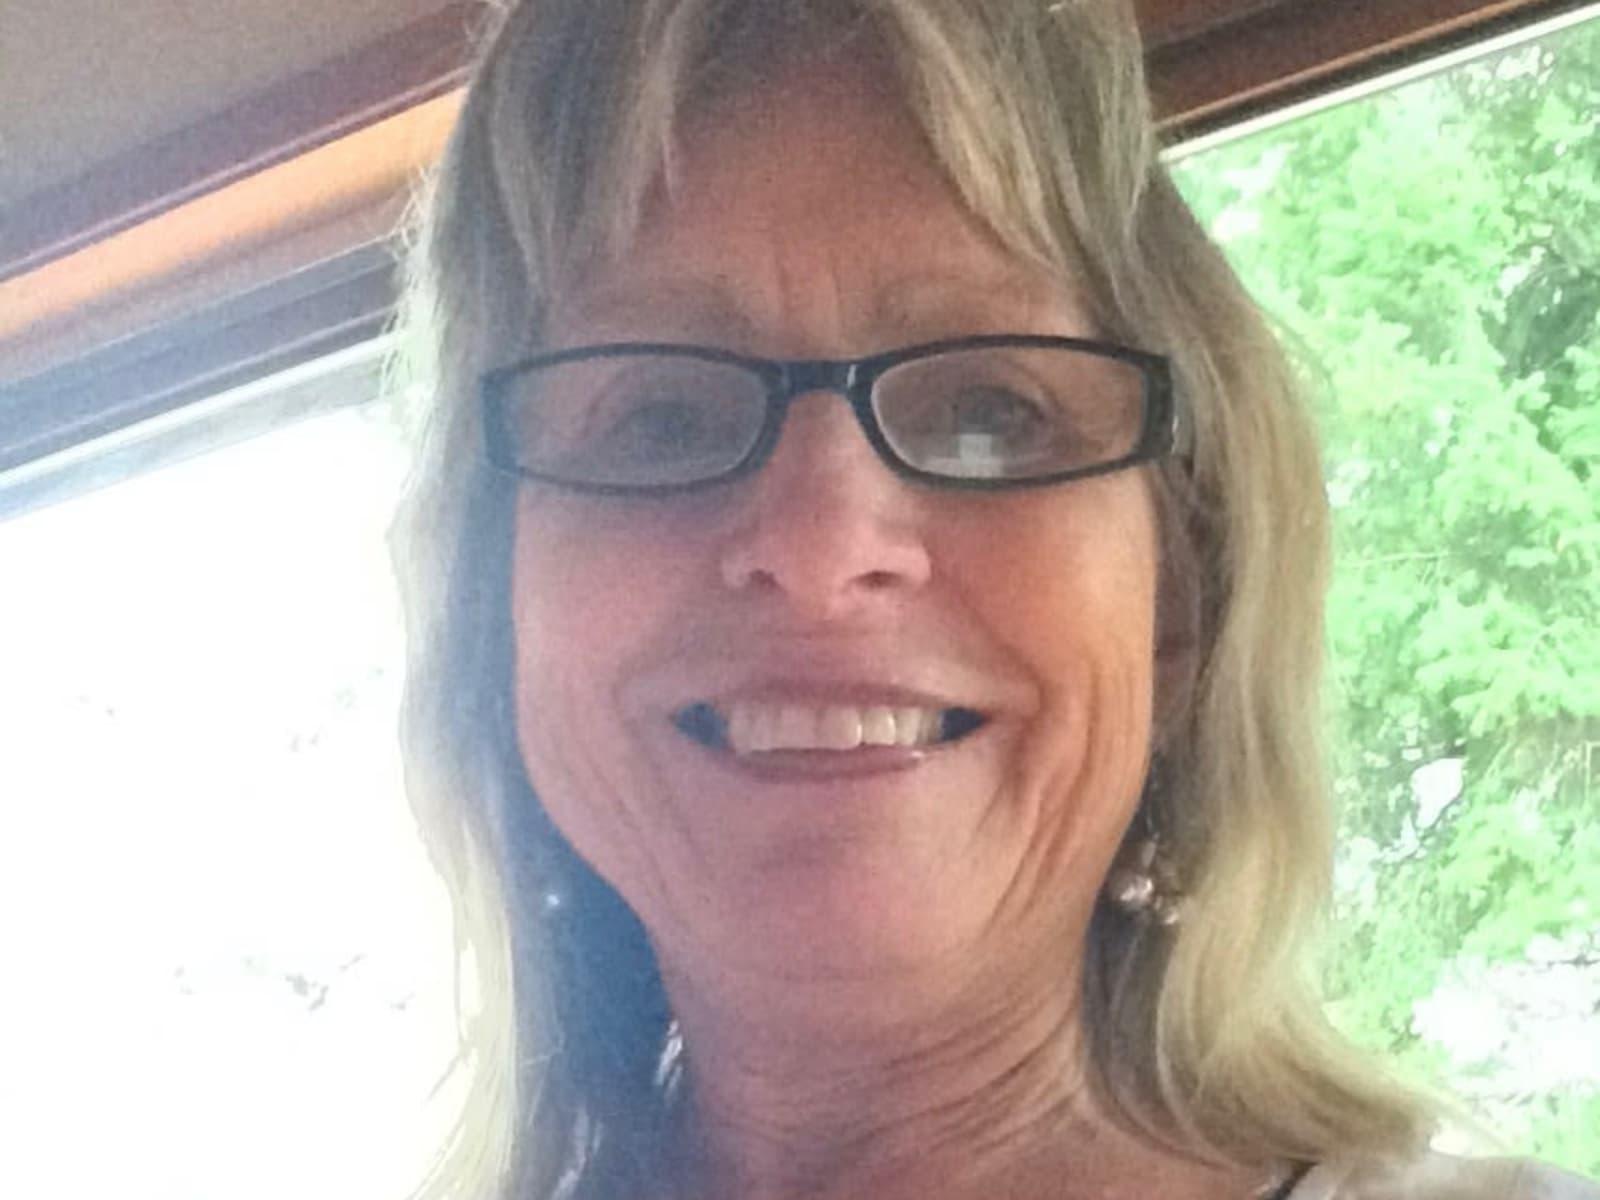 Vicki from Sechelt, British Columbia, Canada